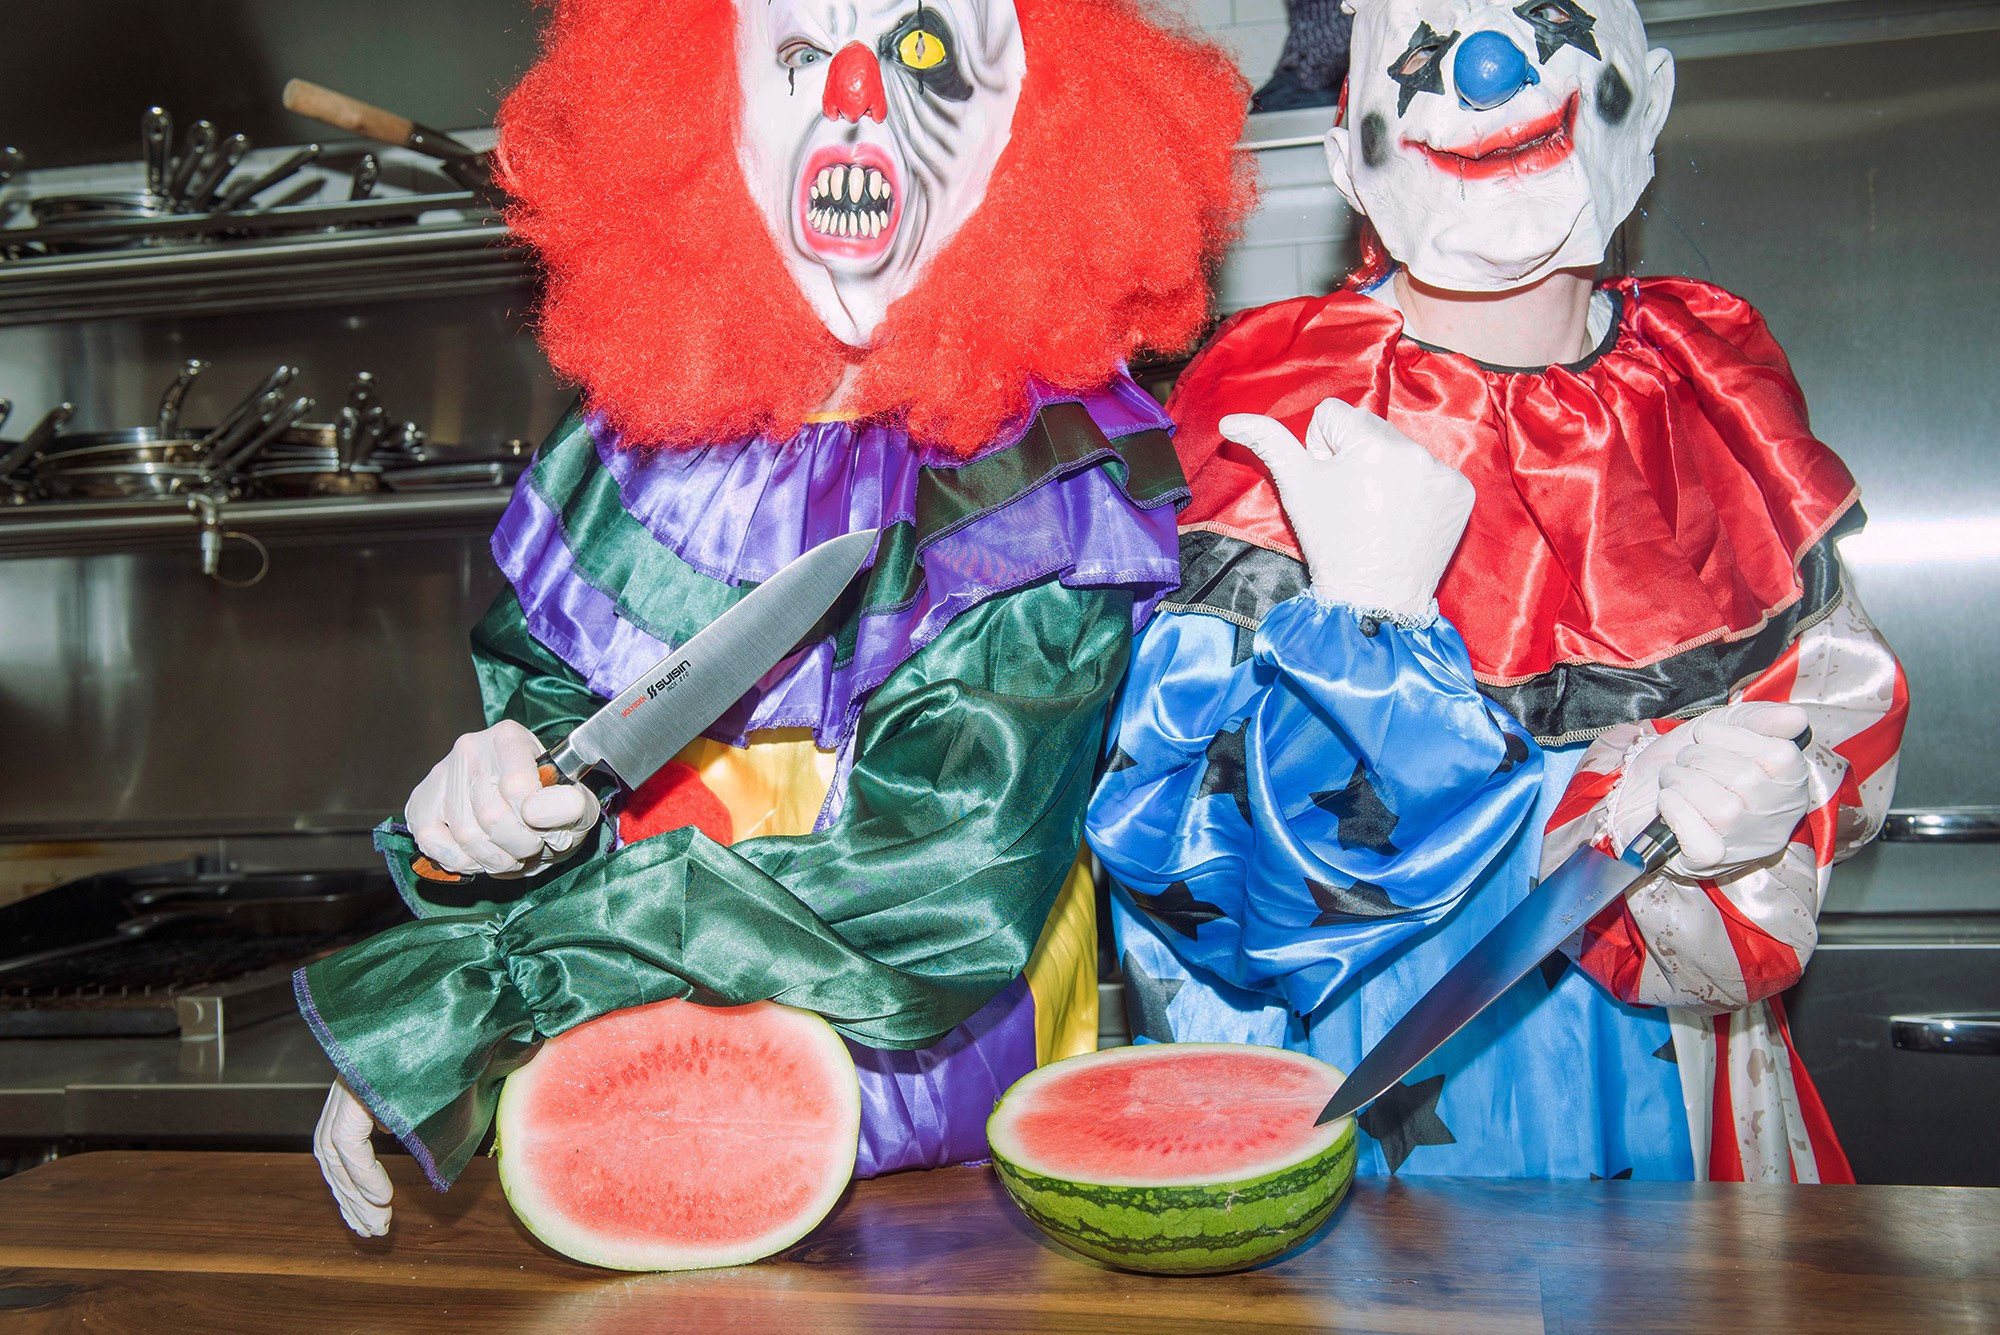 clown-knives-shoot-13